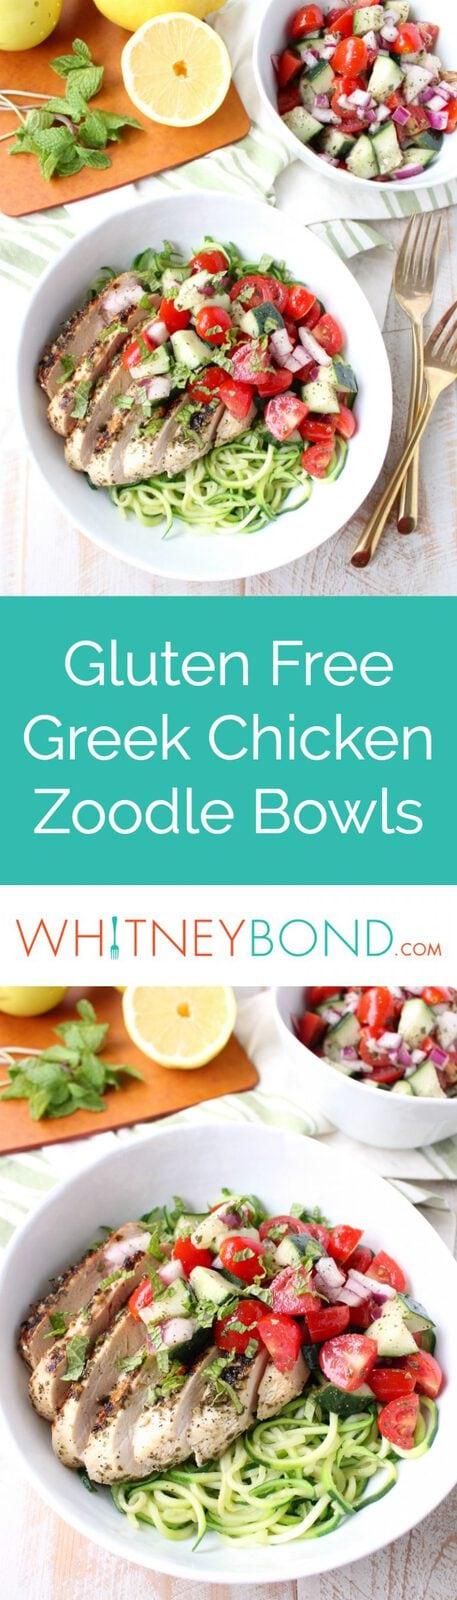 greek-chicken-zoodle-bowls-pinterest